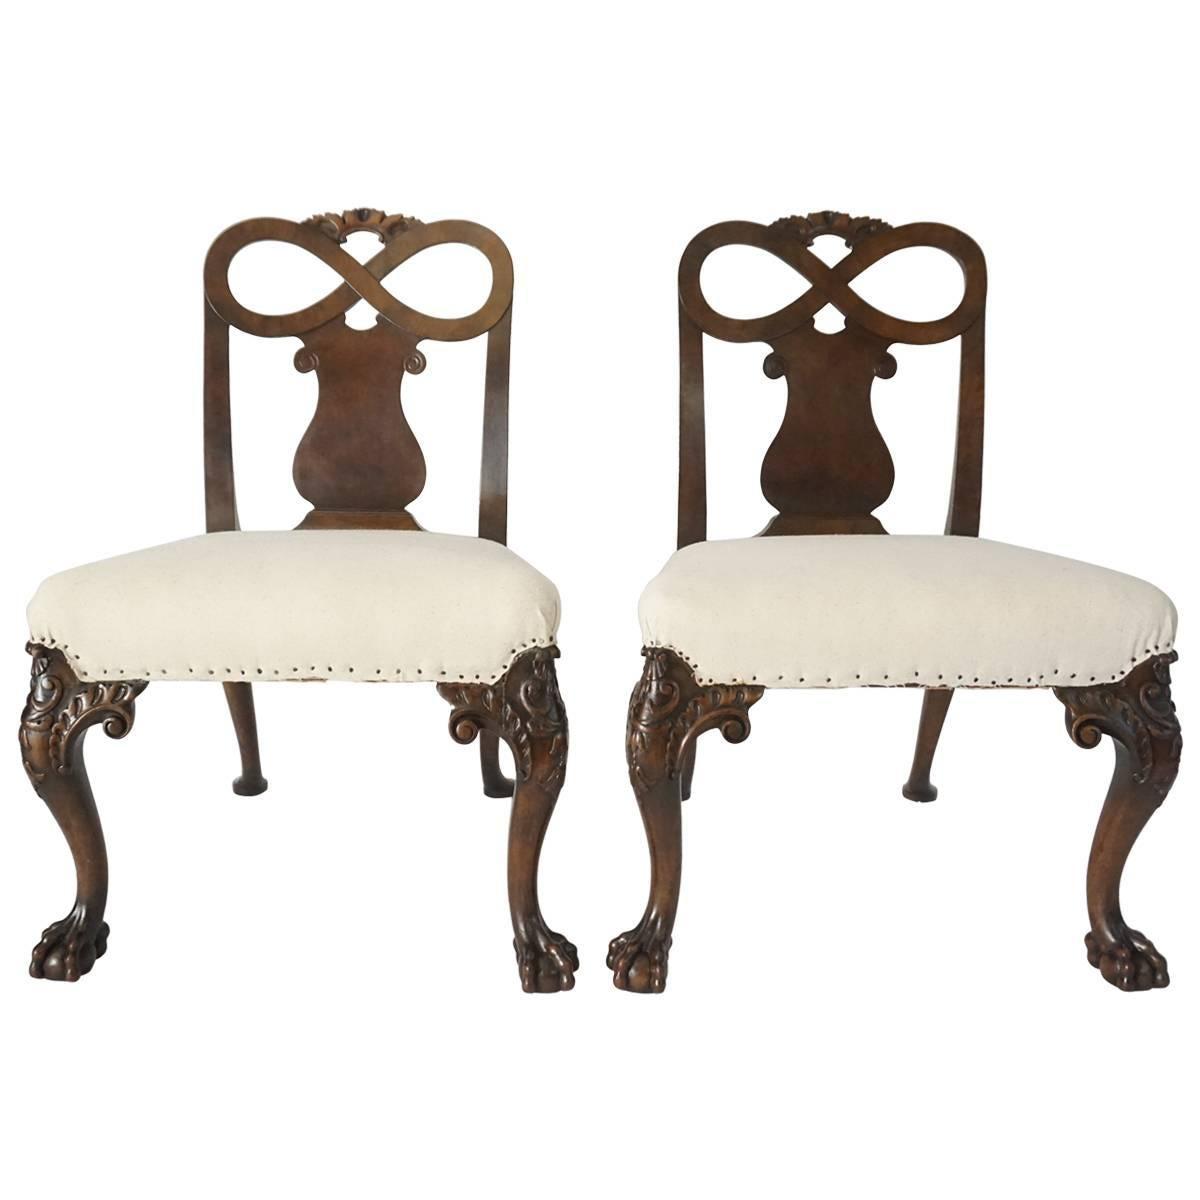 George II Style Carved Walnut Side Chairs, England, circa 1880